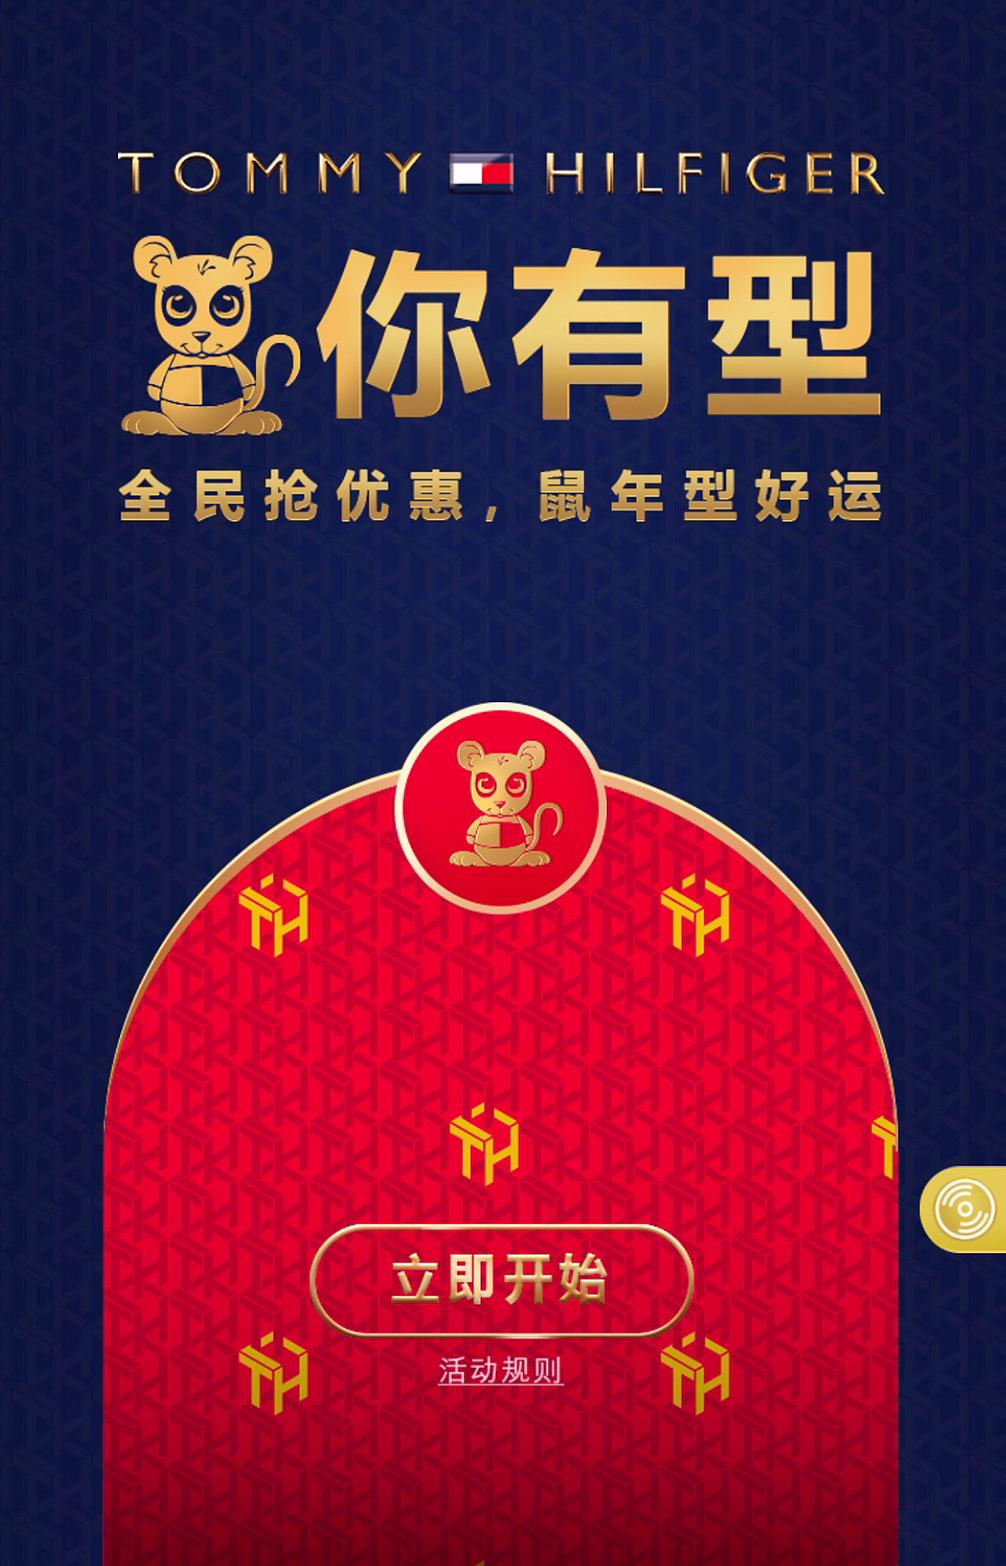 TOMMY HILFIGER 的营销设计案例,以游戏方式吸引用户注册